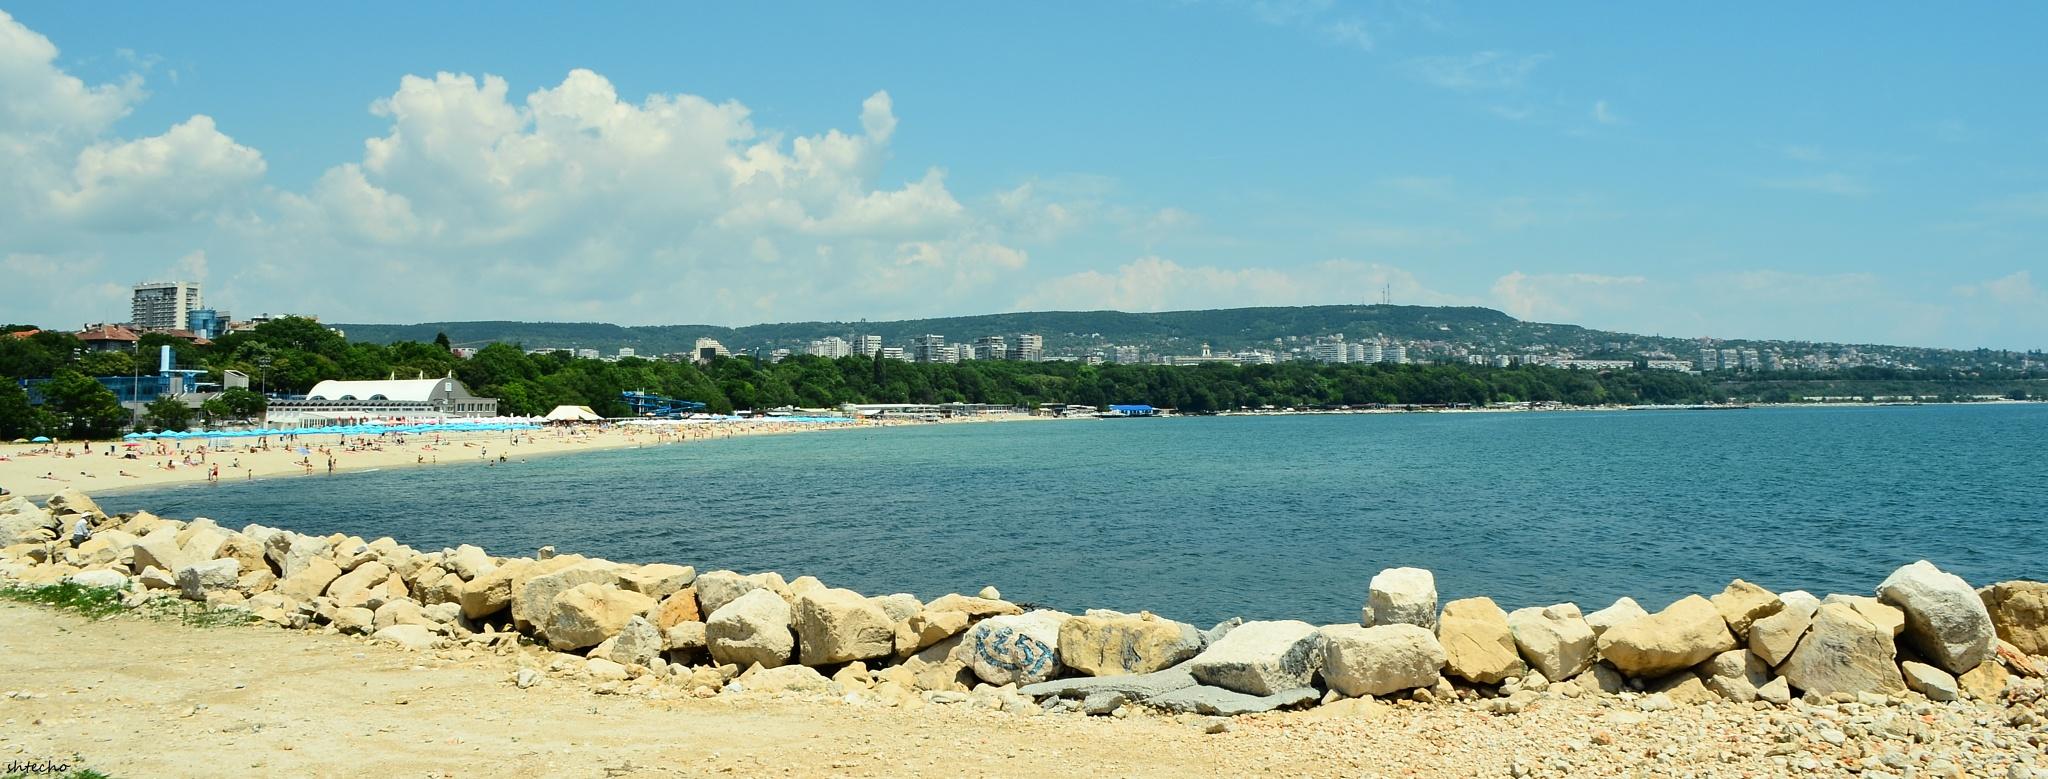 Varna beach Bulgaria ... :) by Sheryo Shterev